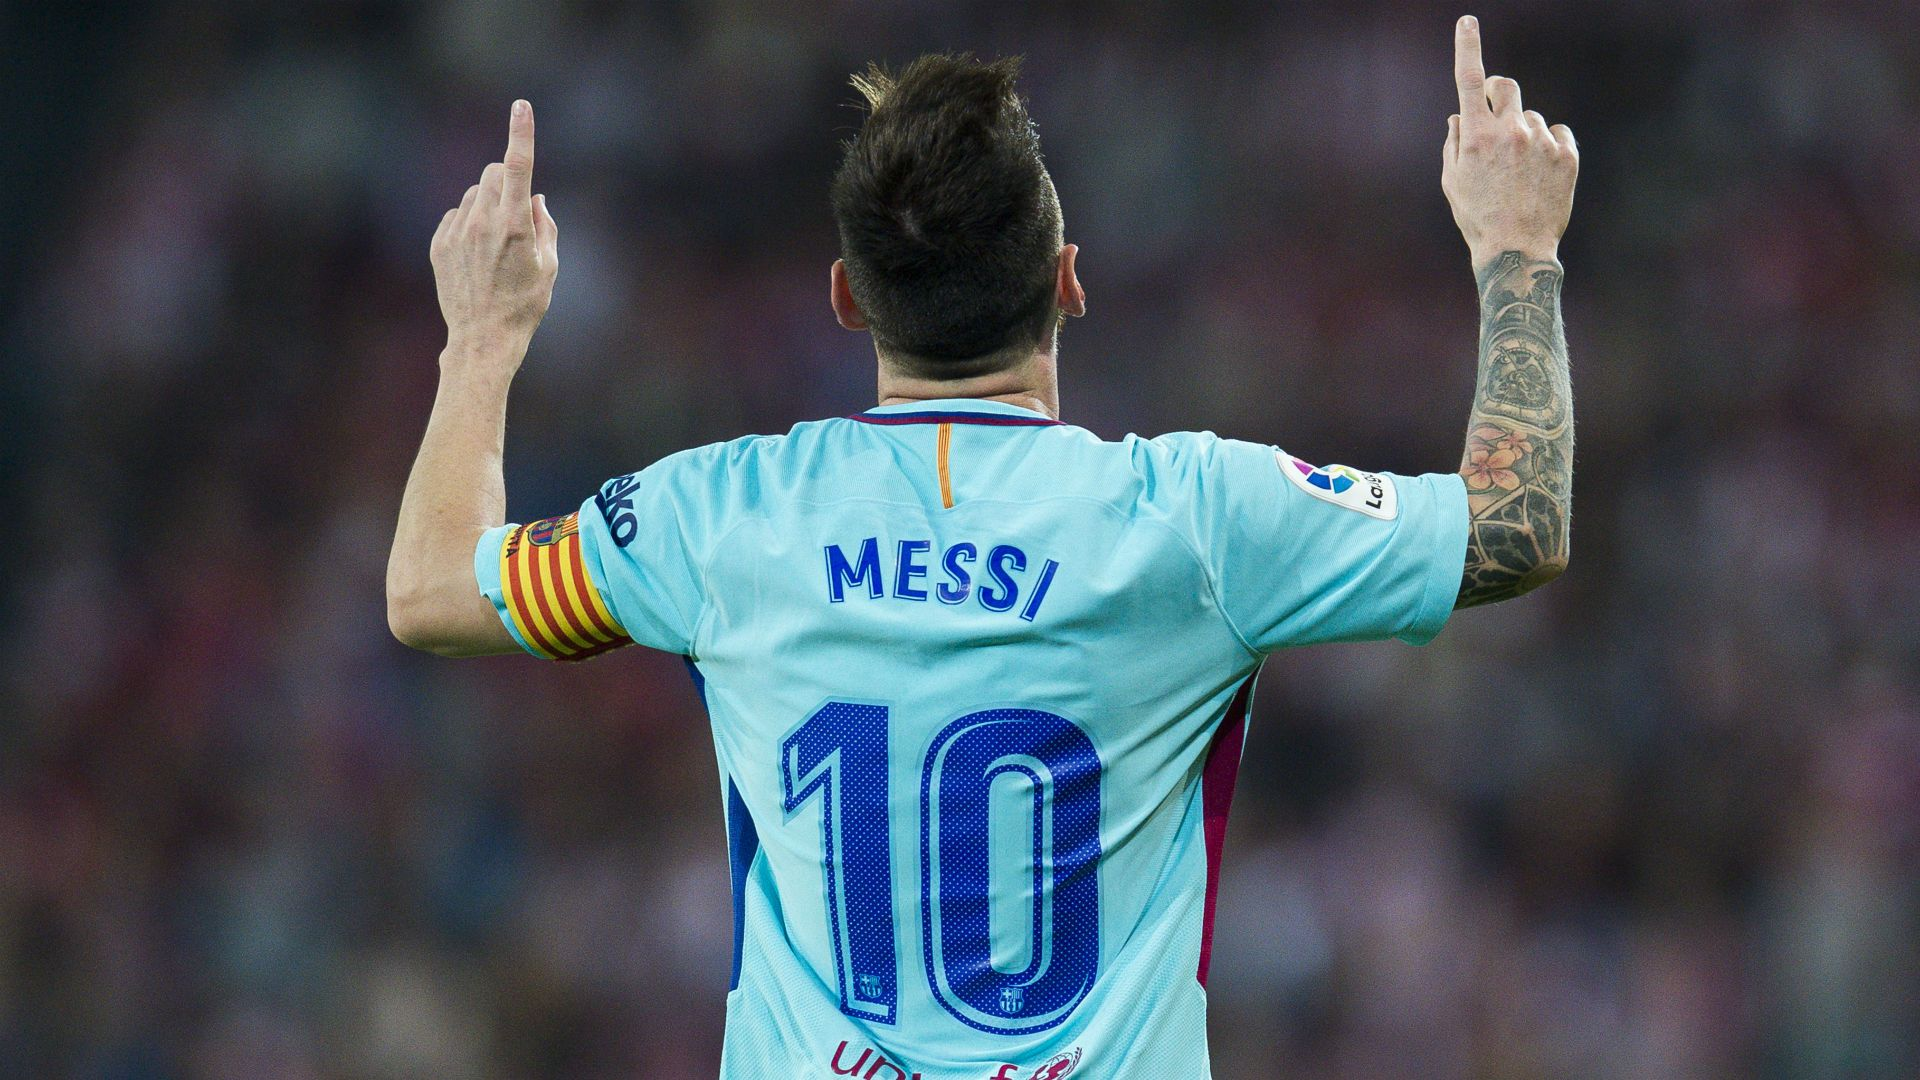 Edigital Digital Marketing Agency Strategy Google Ads Seo Social Media Training Lionel Messi Lionel Messi Wallpapers Messi